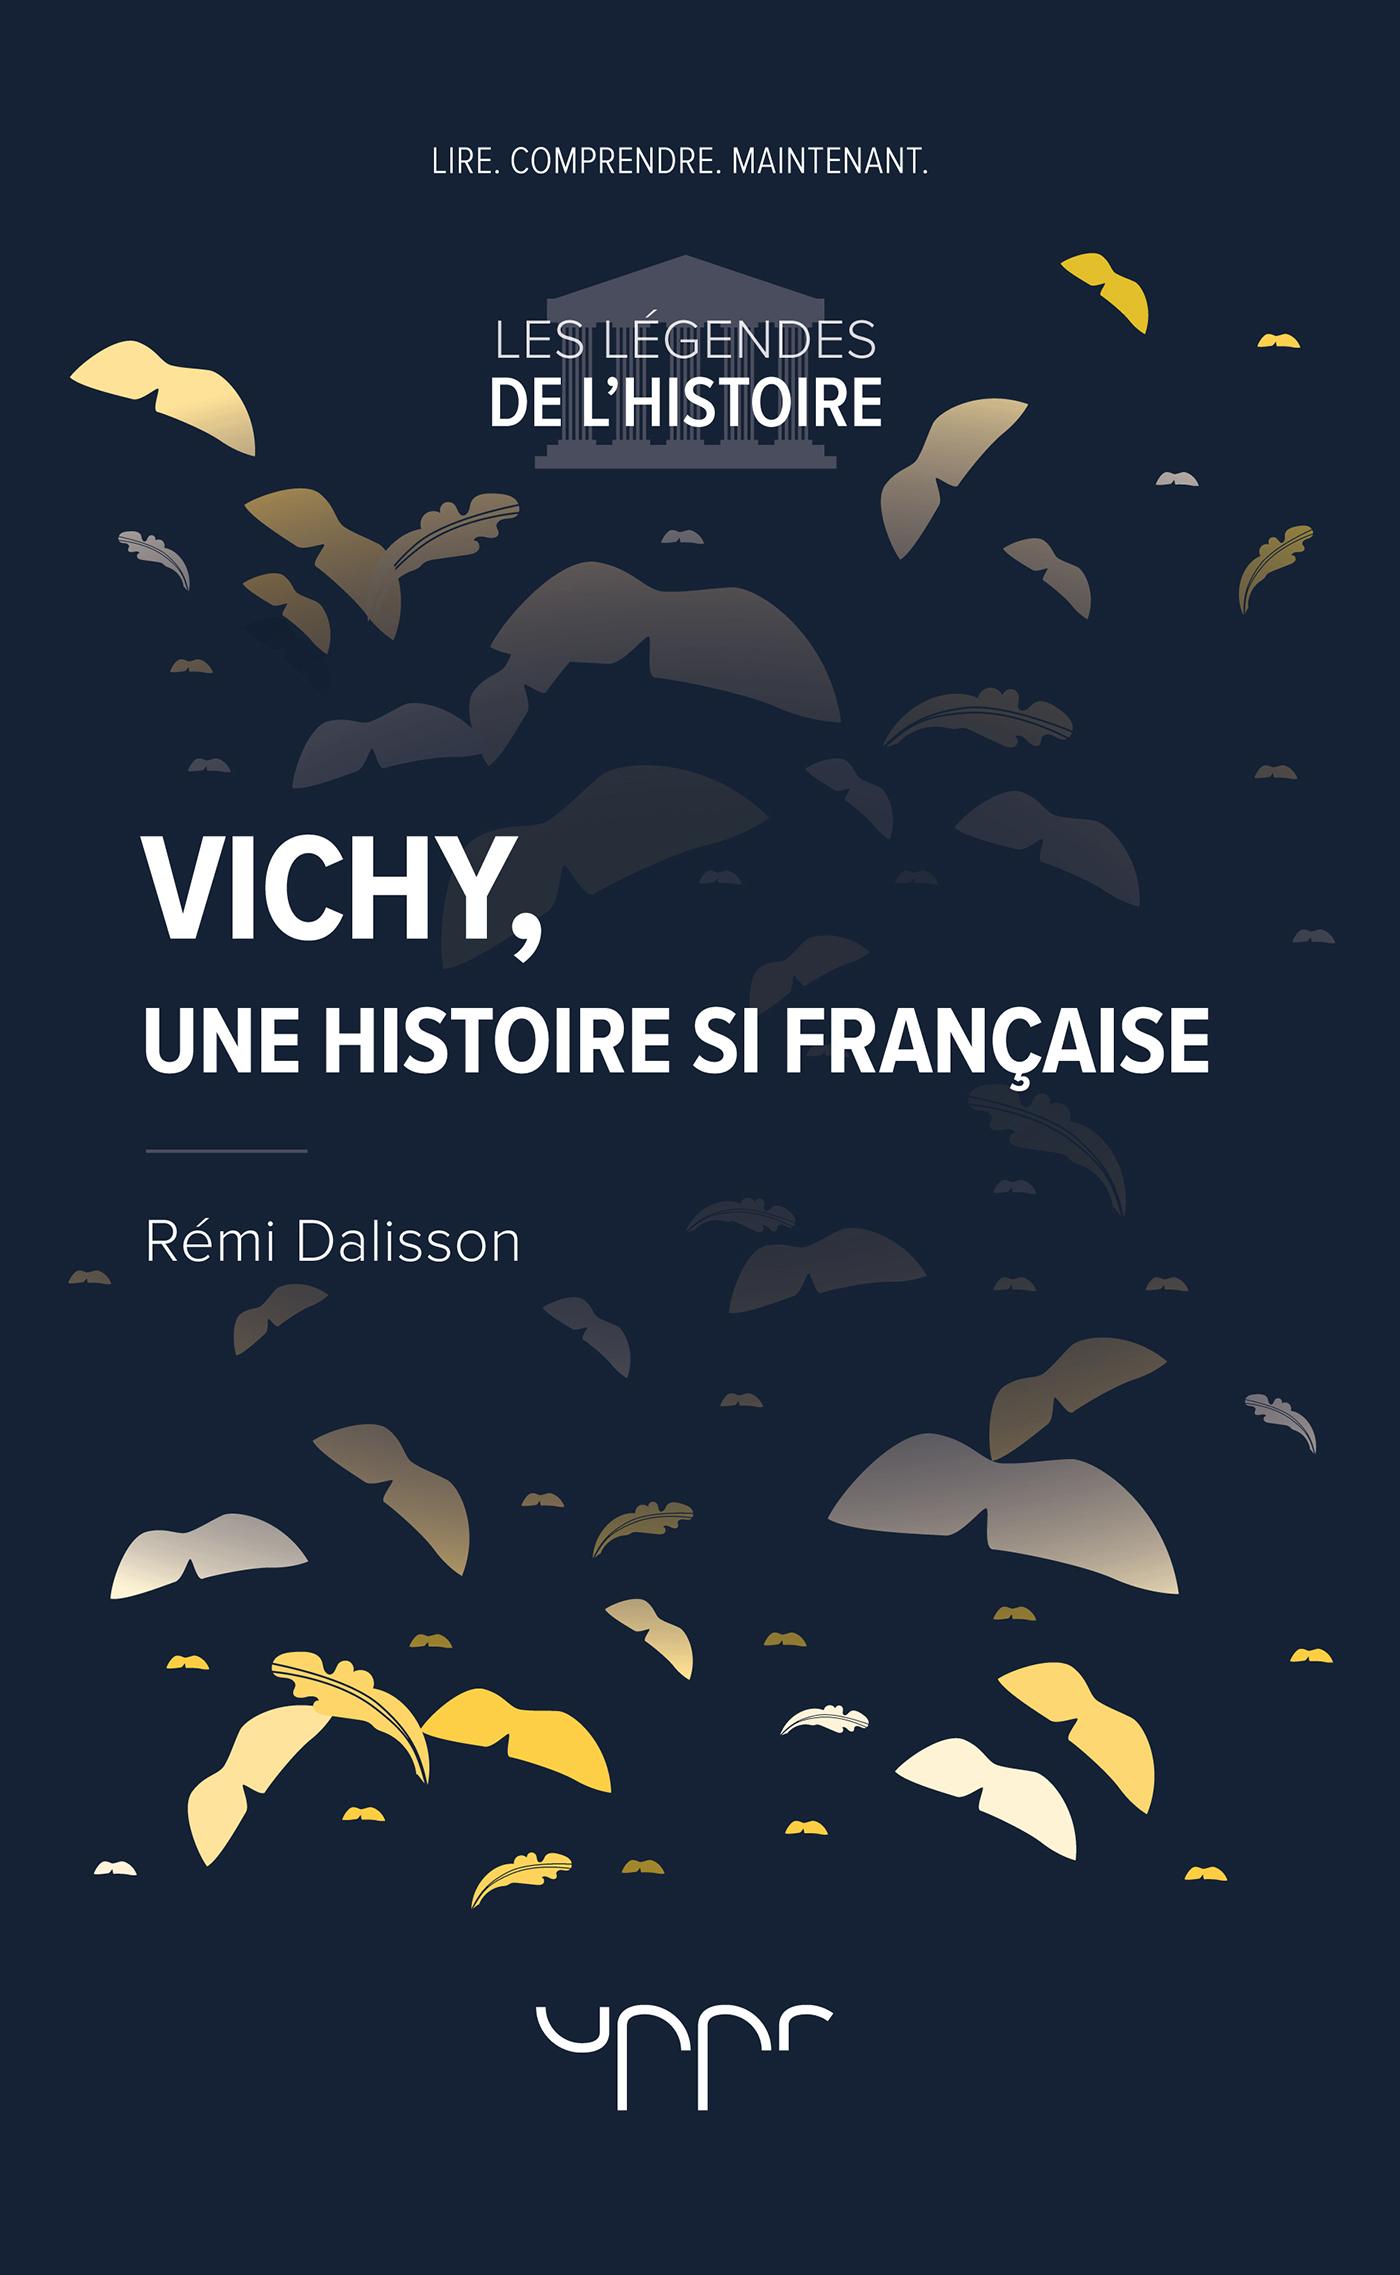 VICHY, UNE HISTOIRE SI FRANCAISE